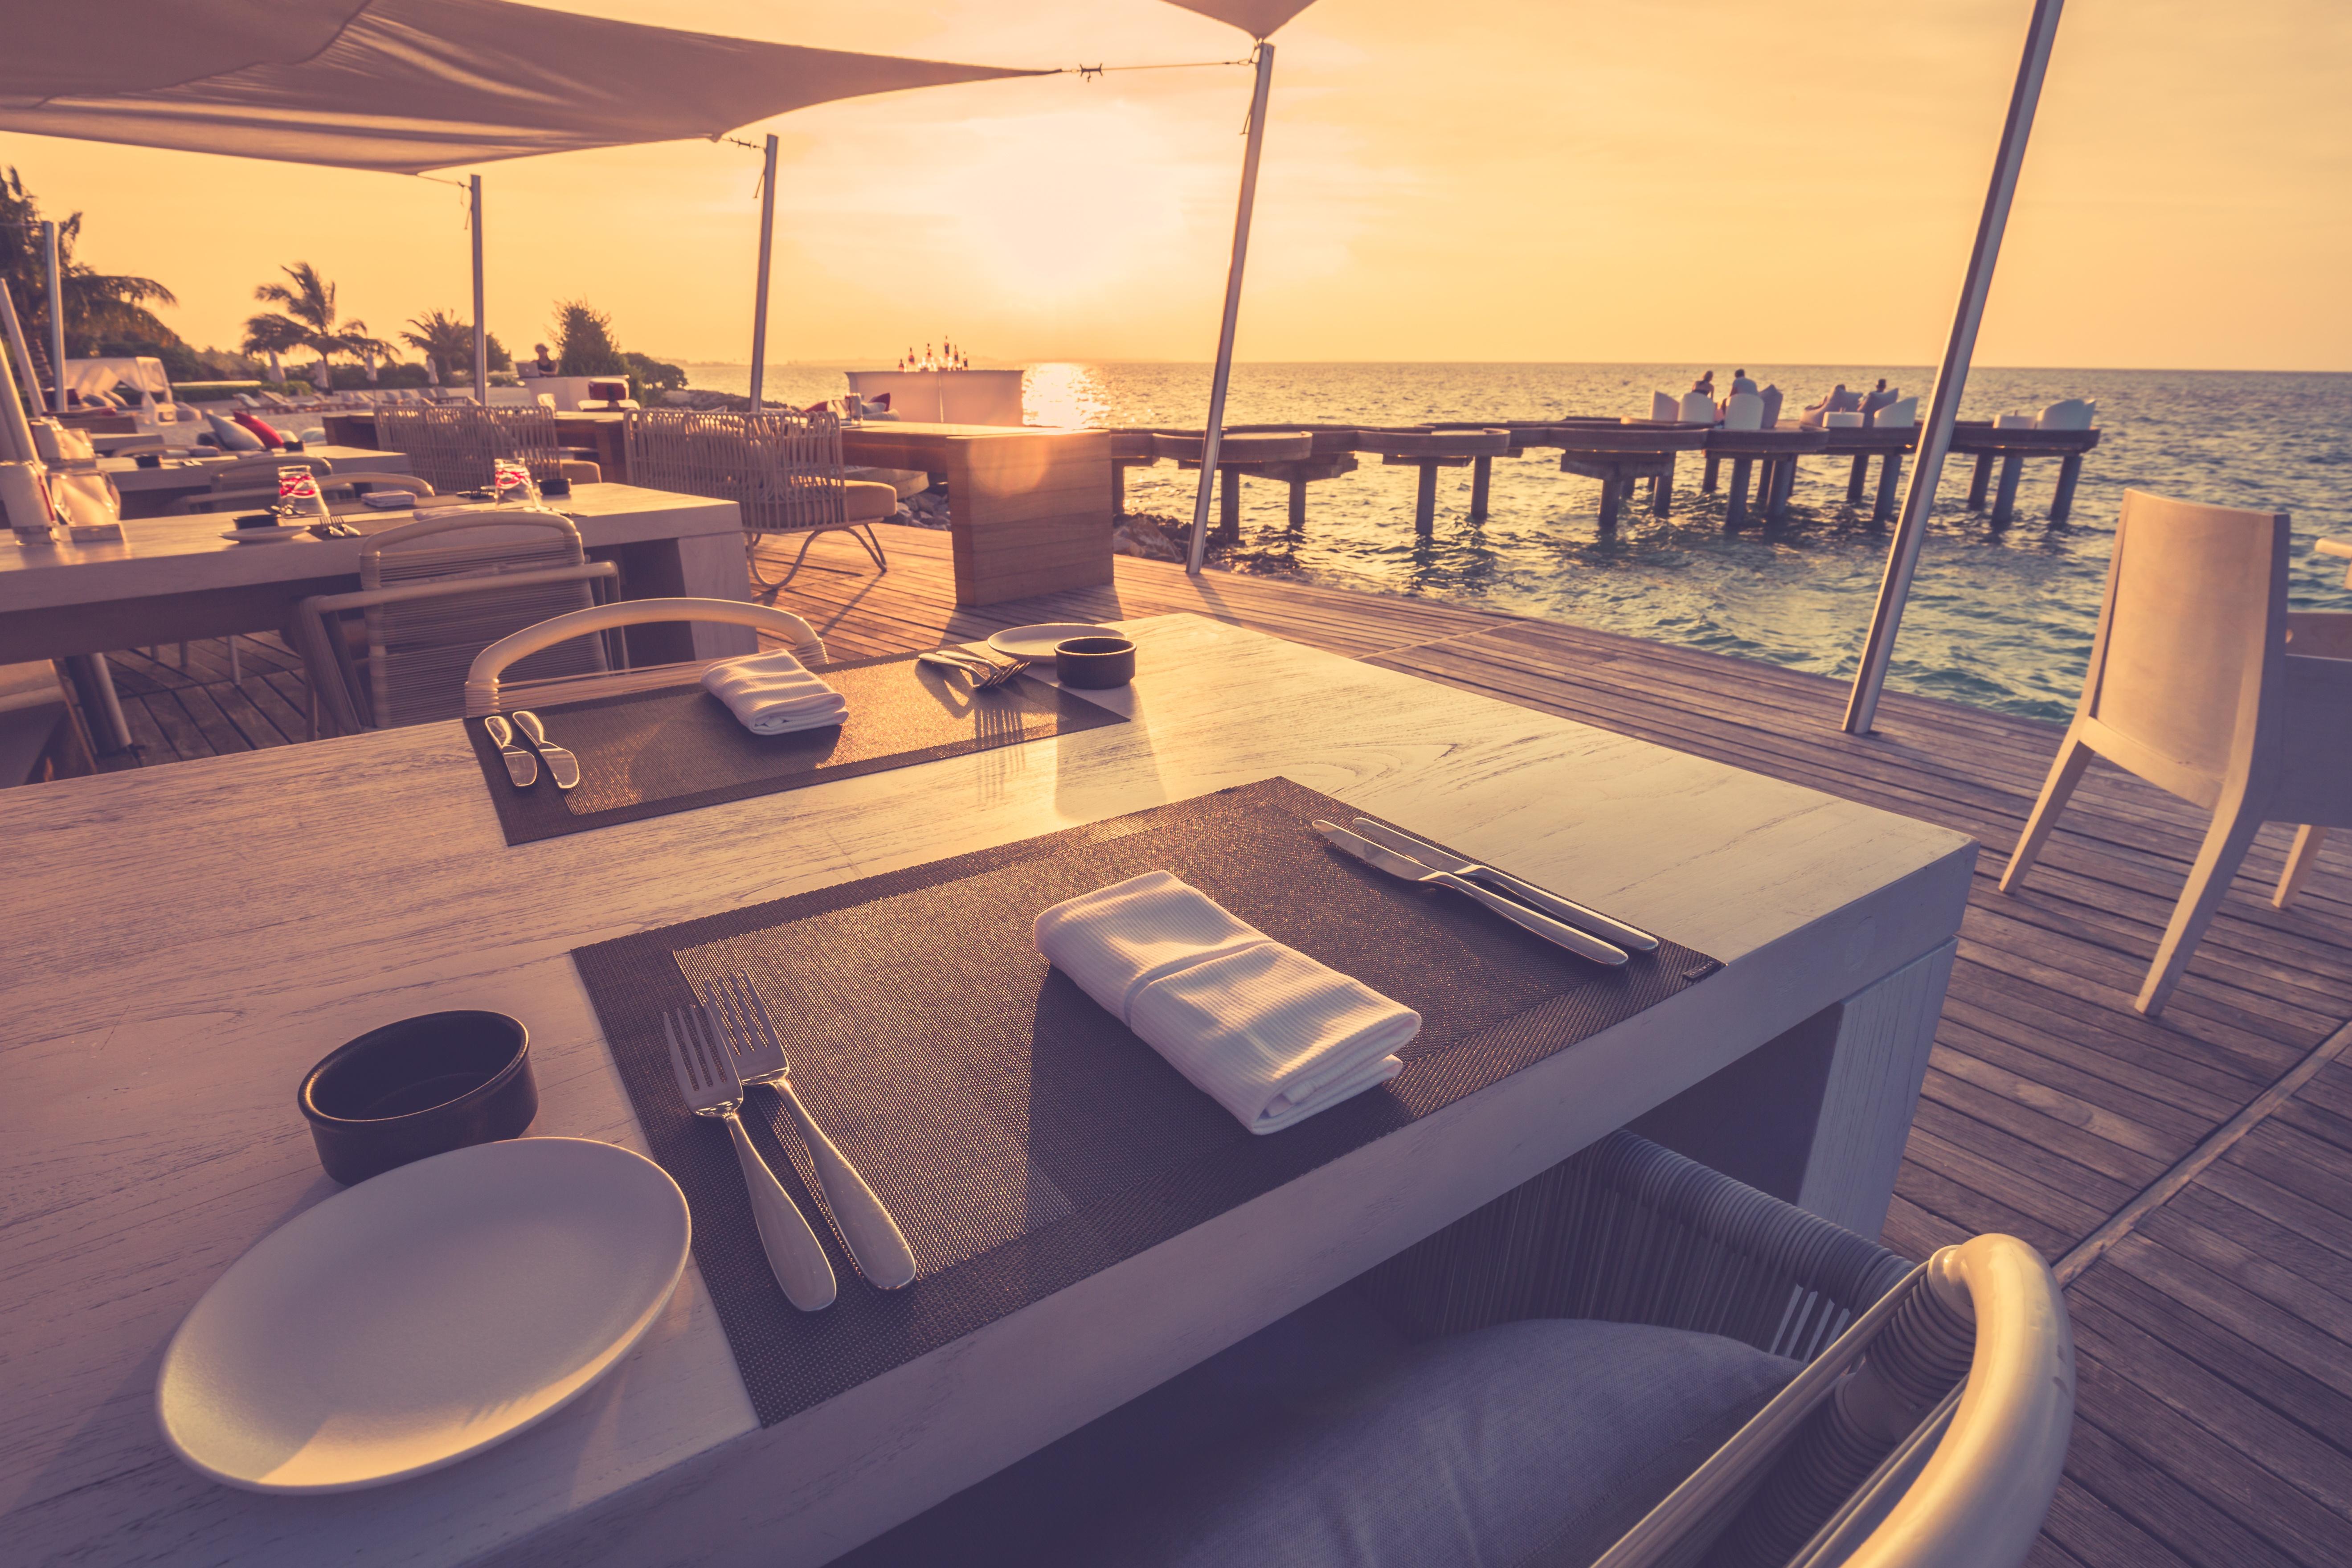 Sarasota's Boat Friendly Restaurants and Bars